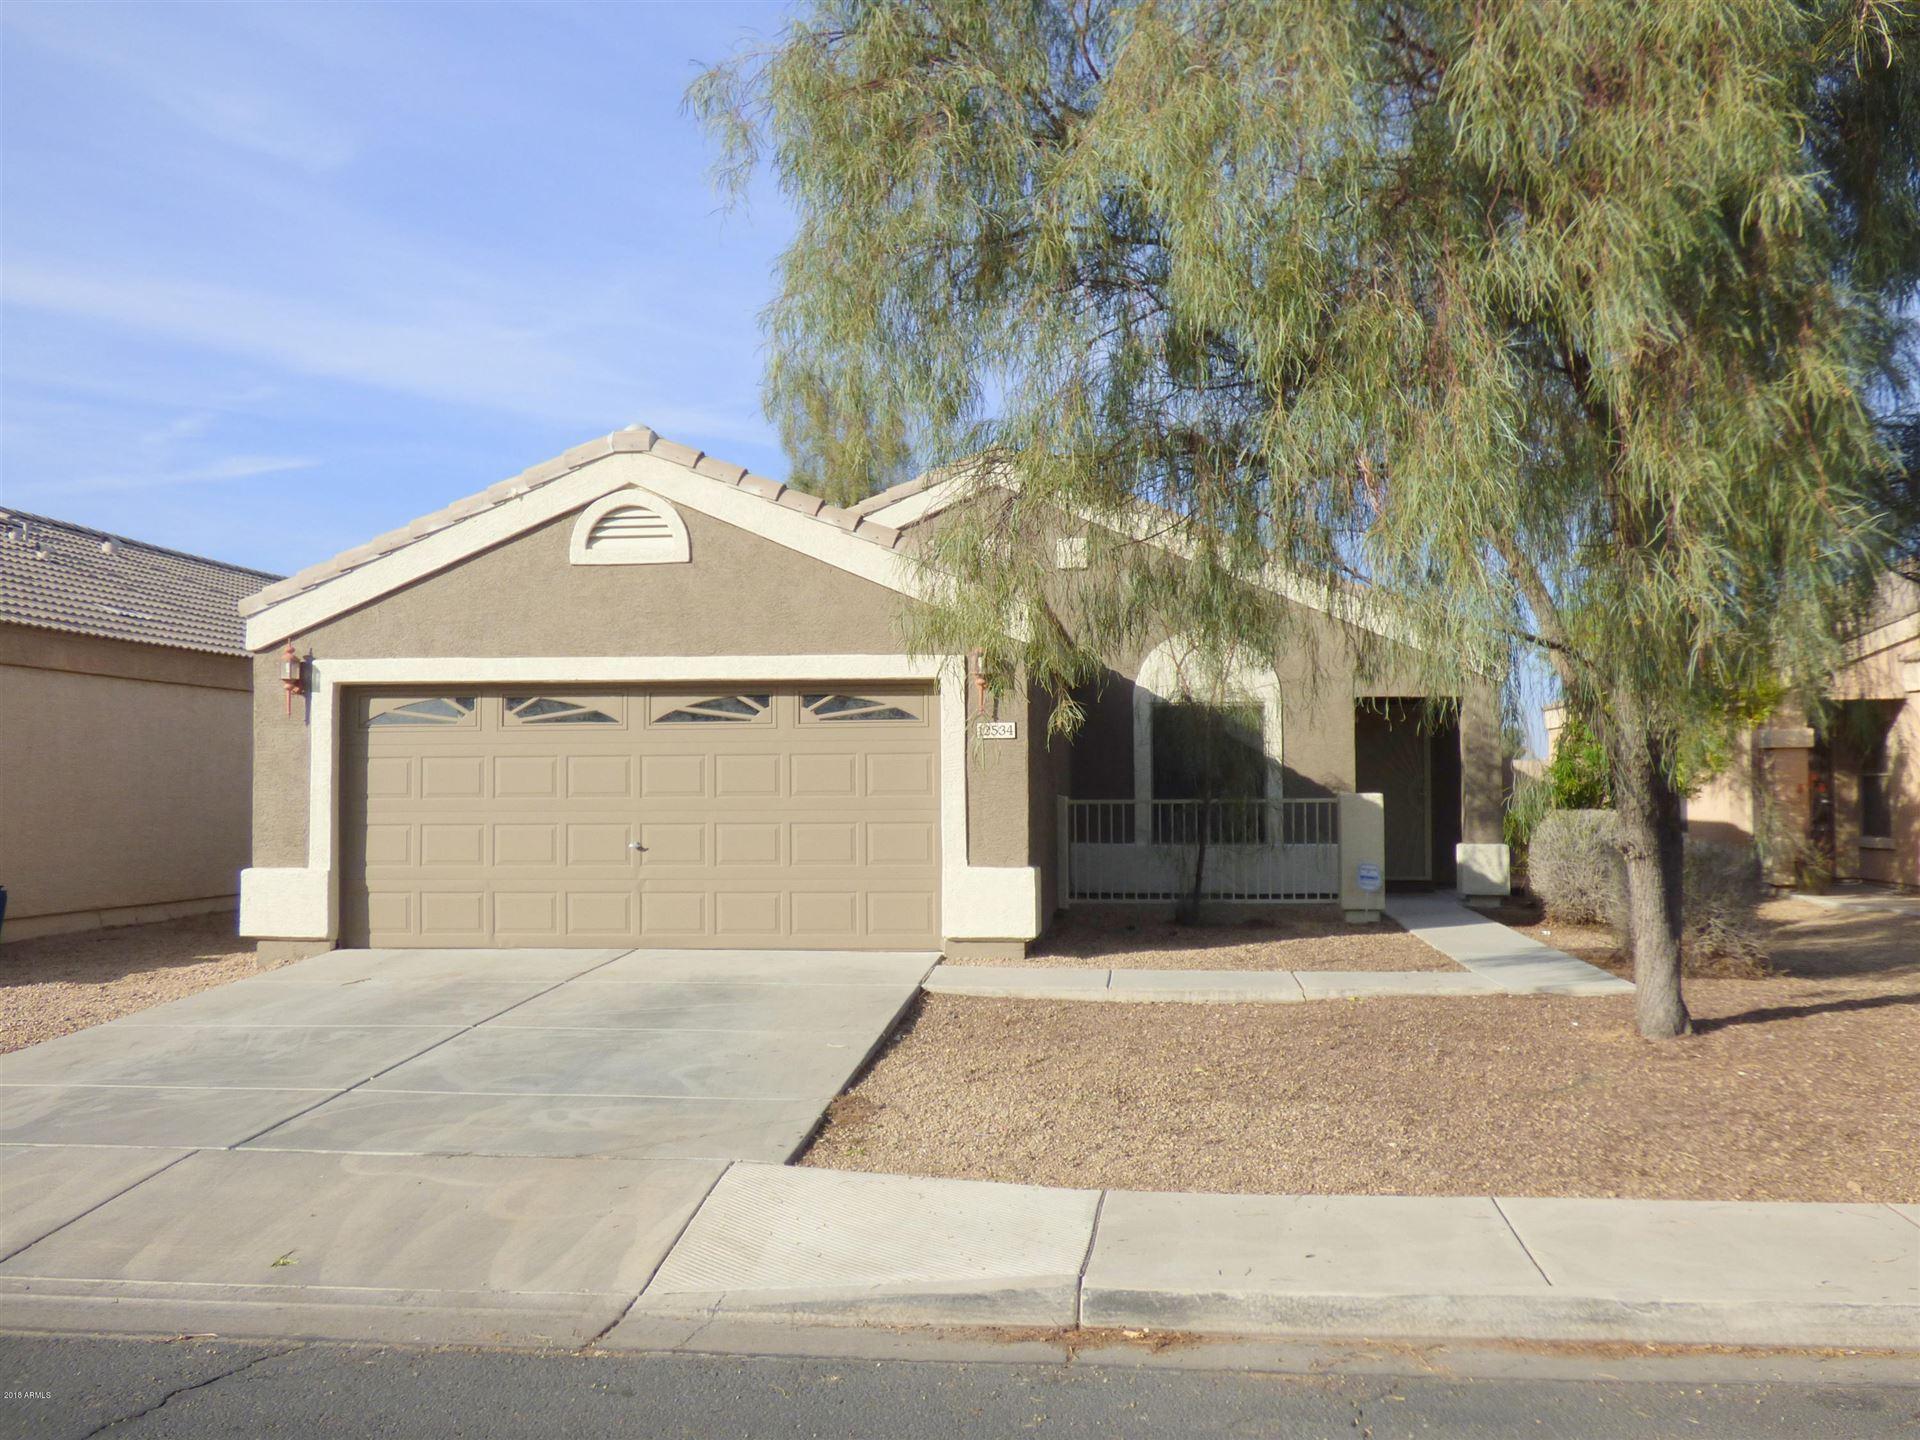 Photo of 12534 W WILLOW Avenue, El Mirage, AZ 85335 (MLS # 6228554)